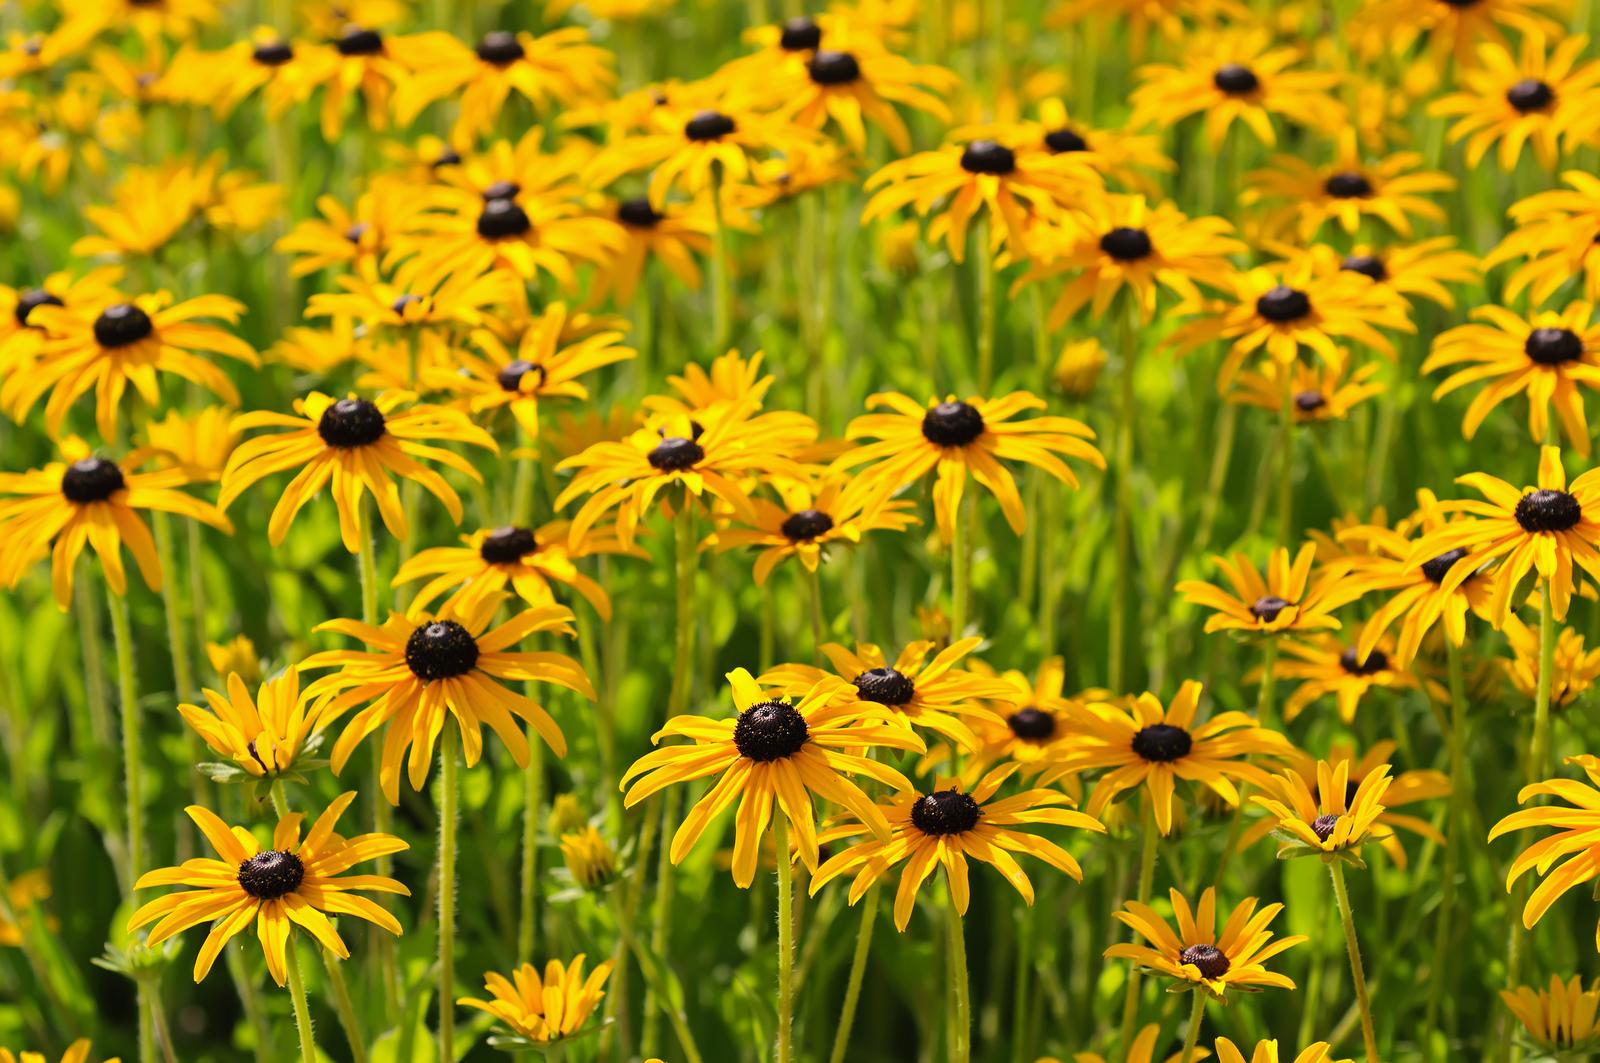 bigstock-Rudbekia-flowers-66159256.jpg